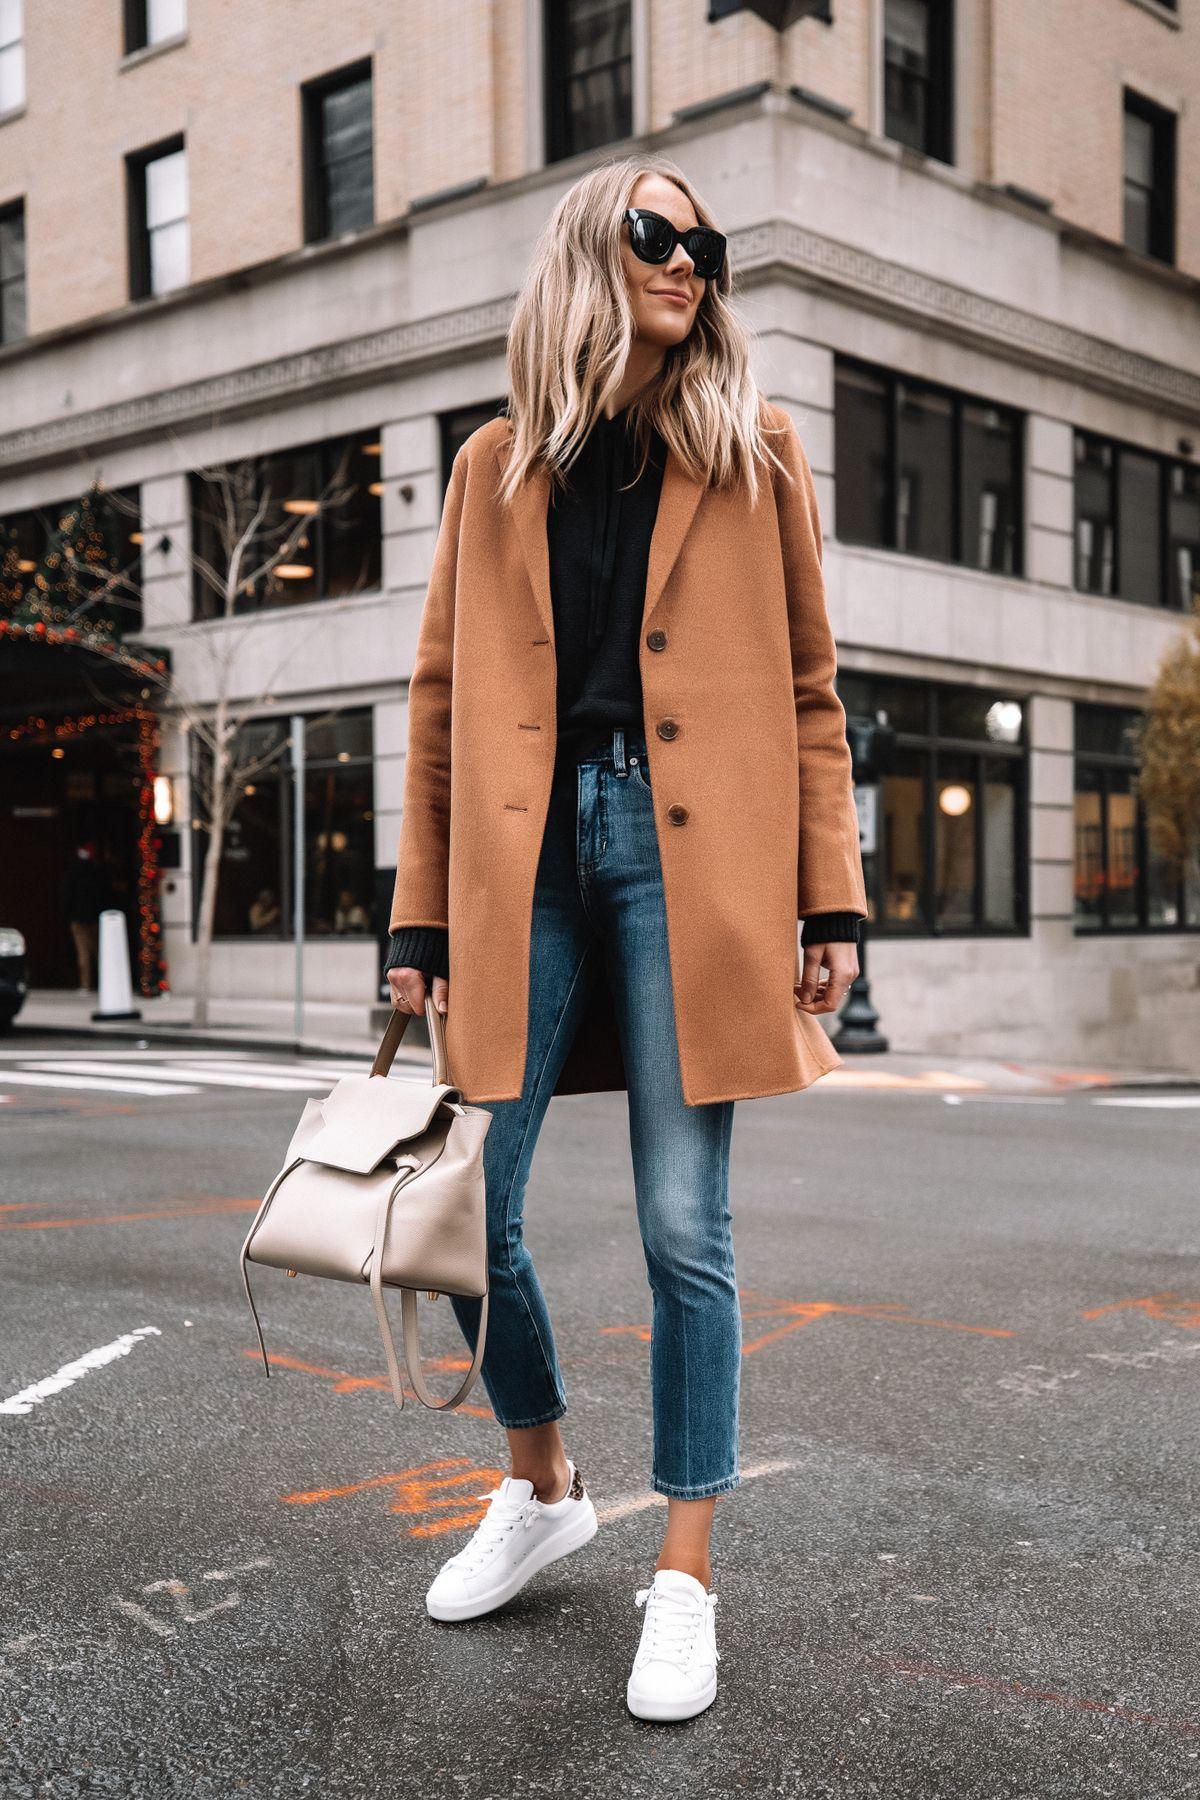 Camel Coat, but Keep it Casual | Fashion Jackson